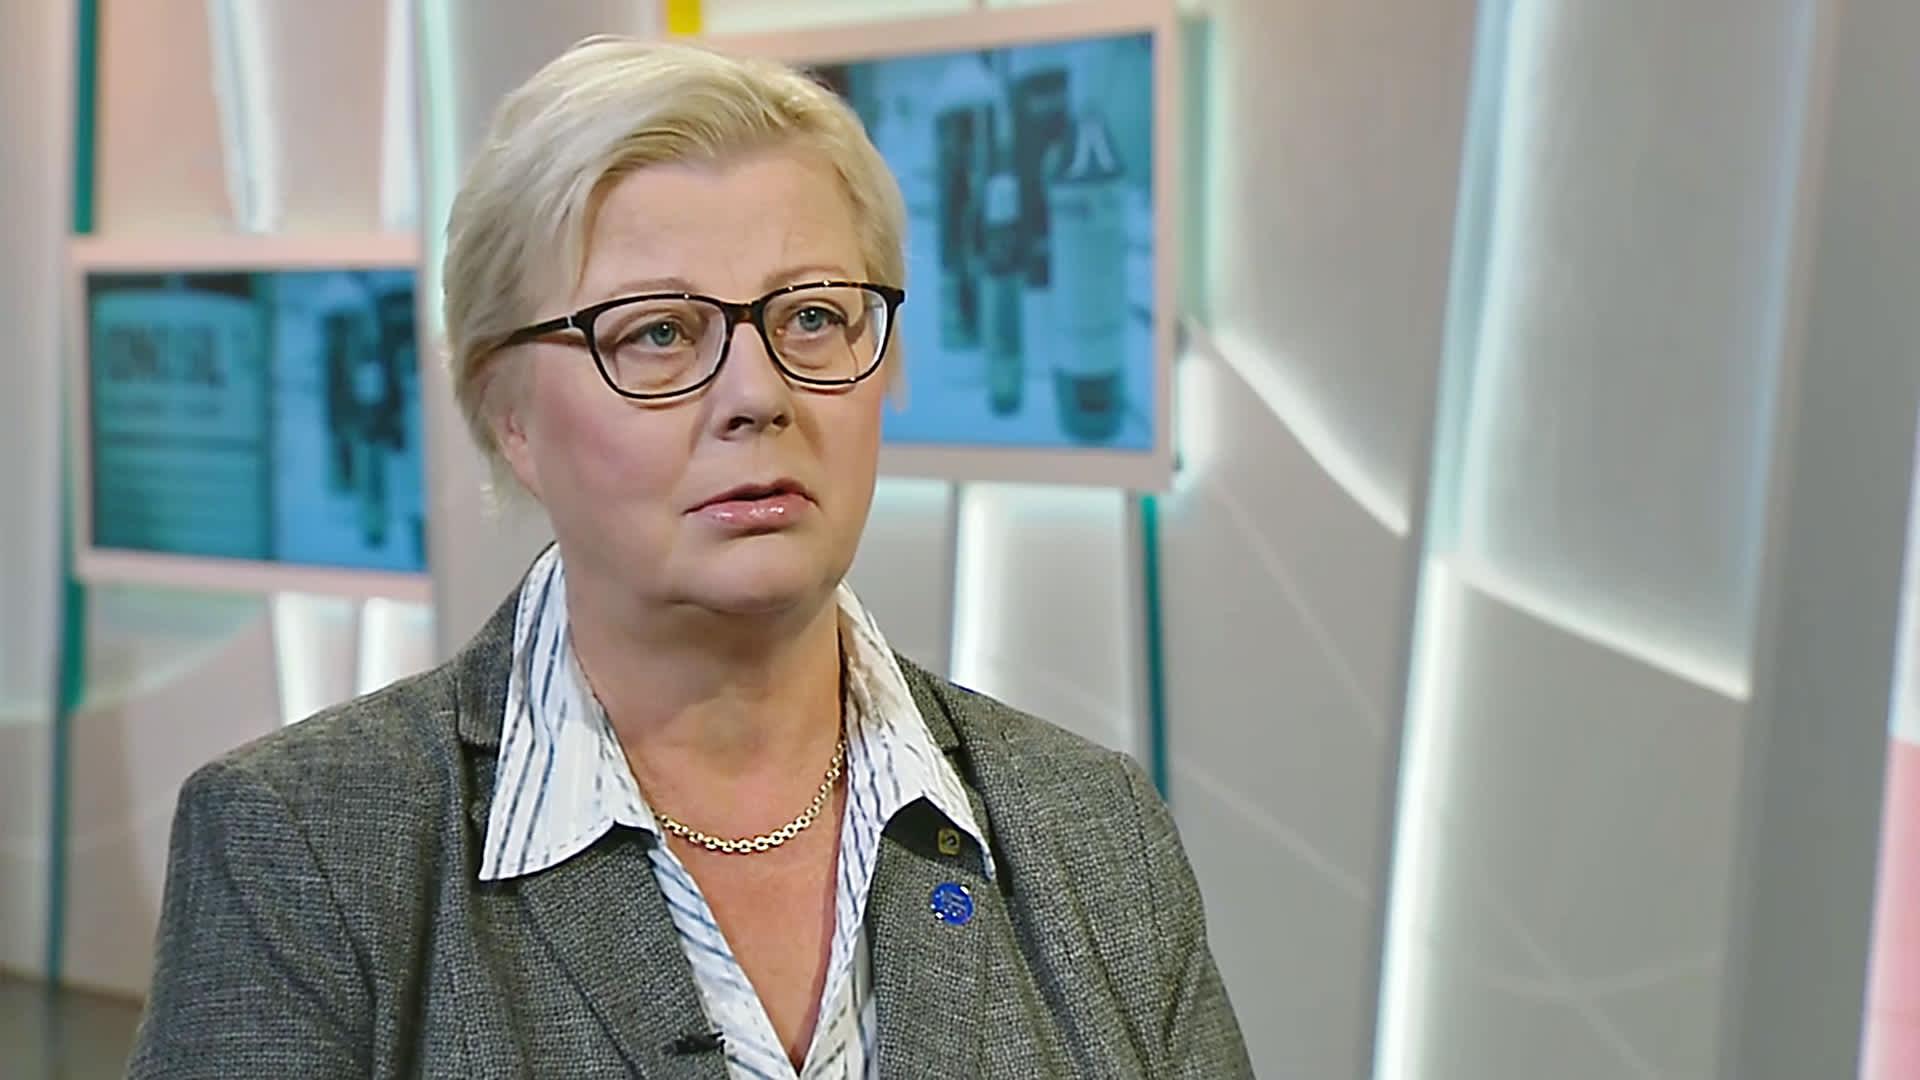 Kati Myllymäki